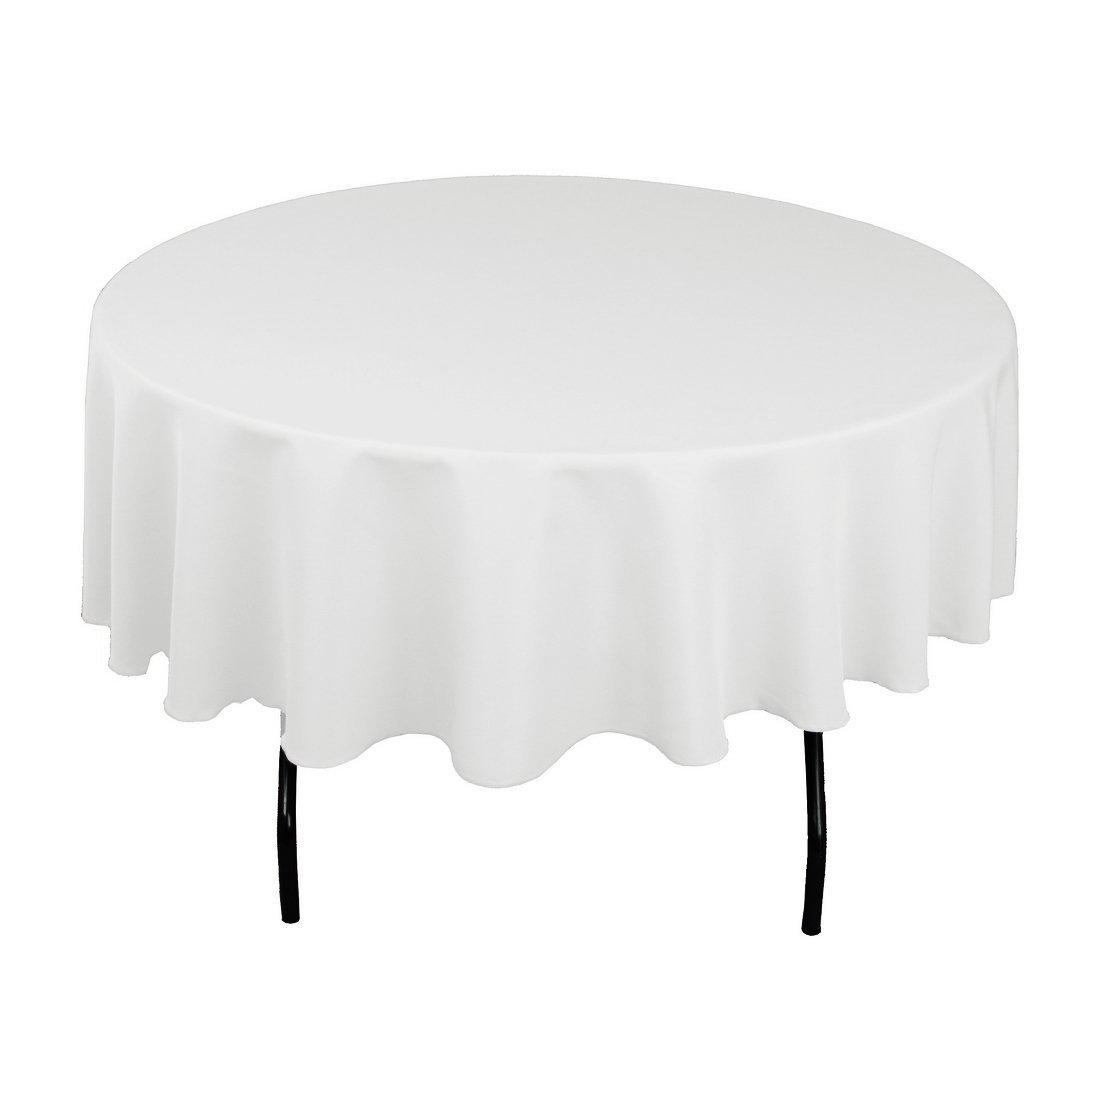 White Table Cloth 90×90